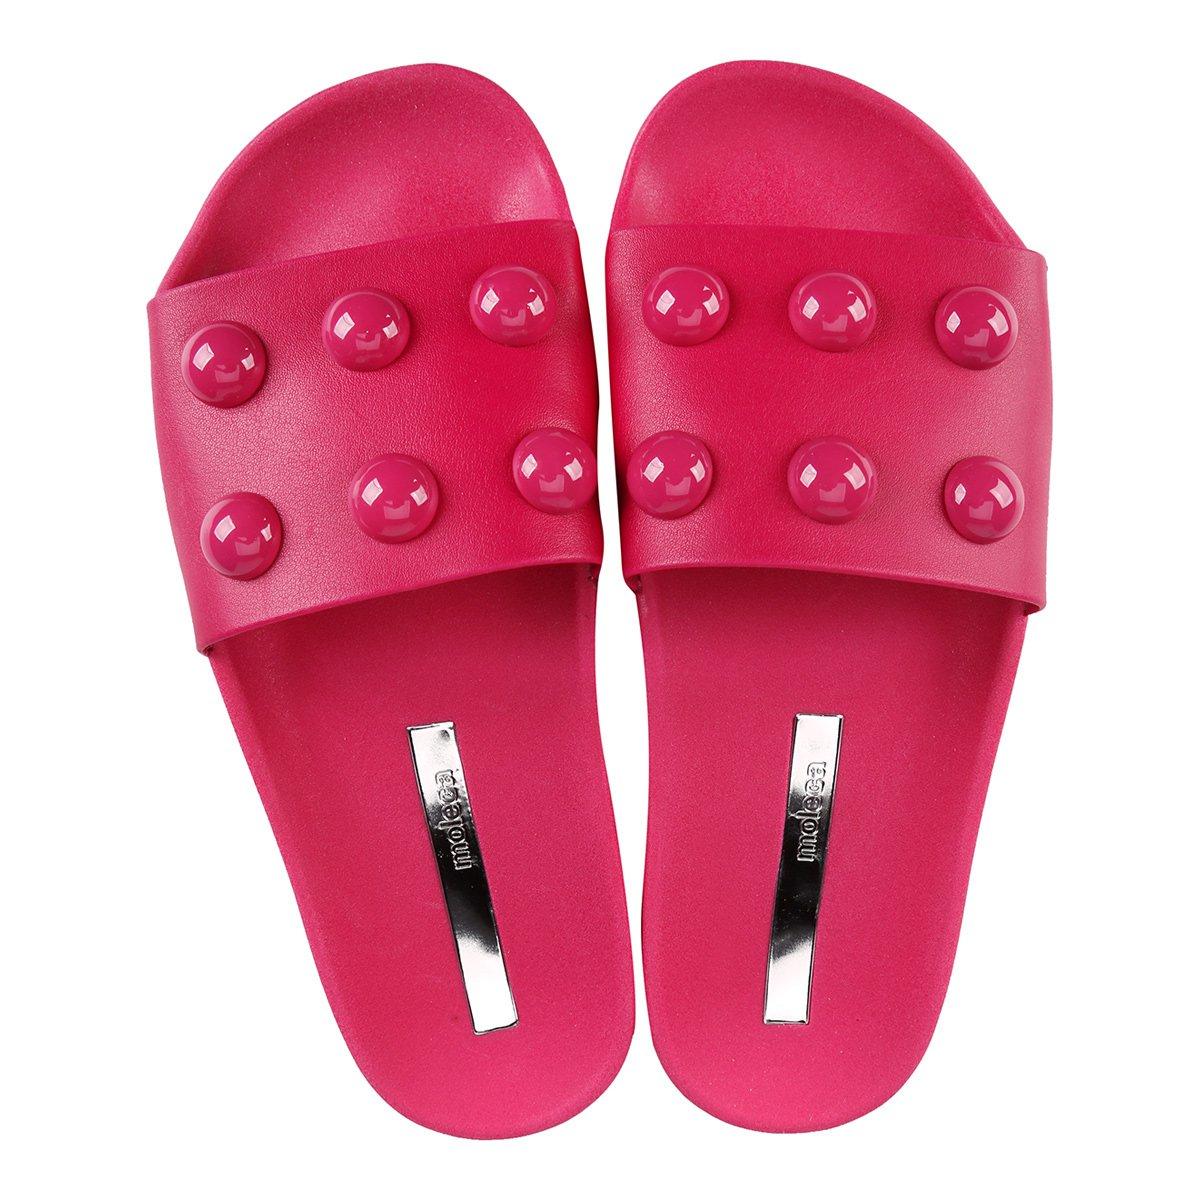 Pink Moleca Bolinhas Slide Multi Chinelo Multi Slide Moleca Slide Bolinhas Pink Chinelo Feminino Feminino Chinelo Moleca q4xZpSw